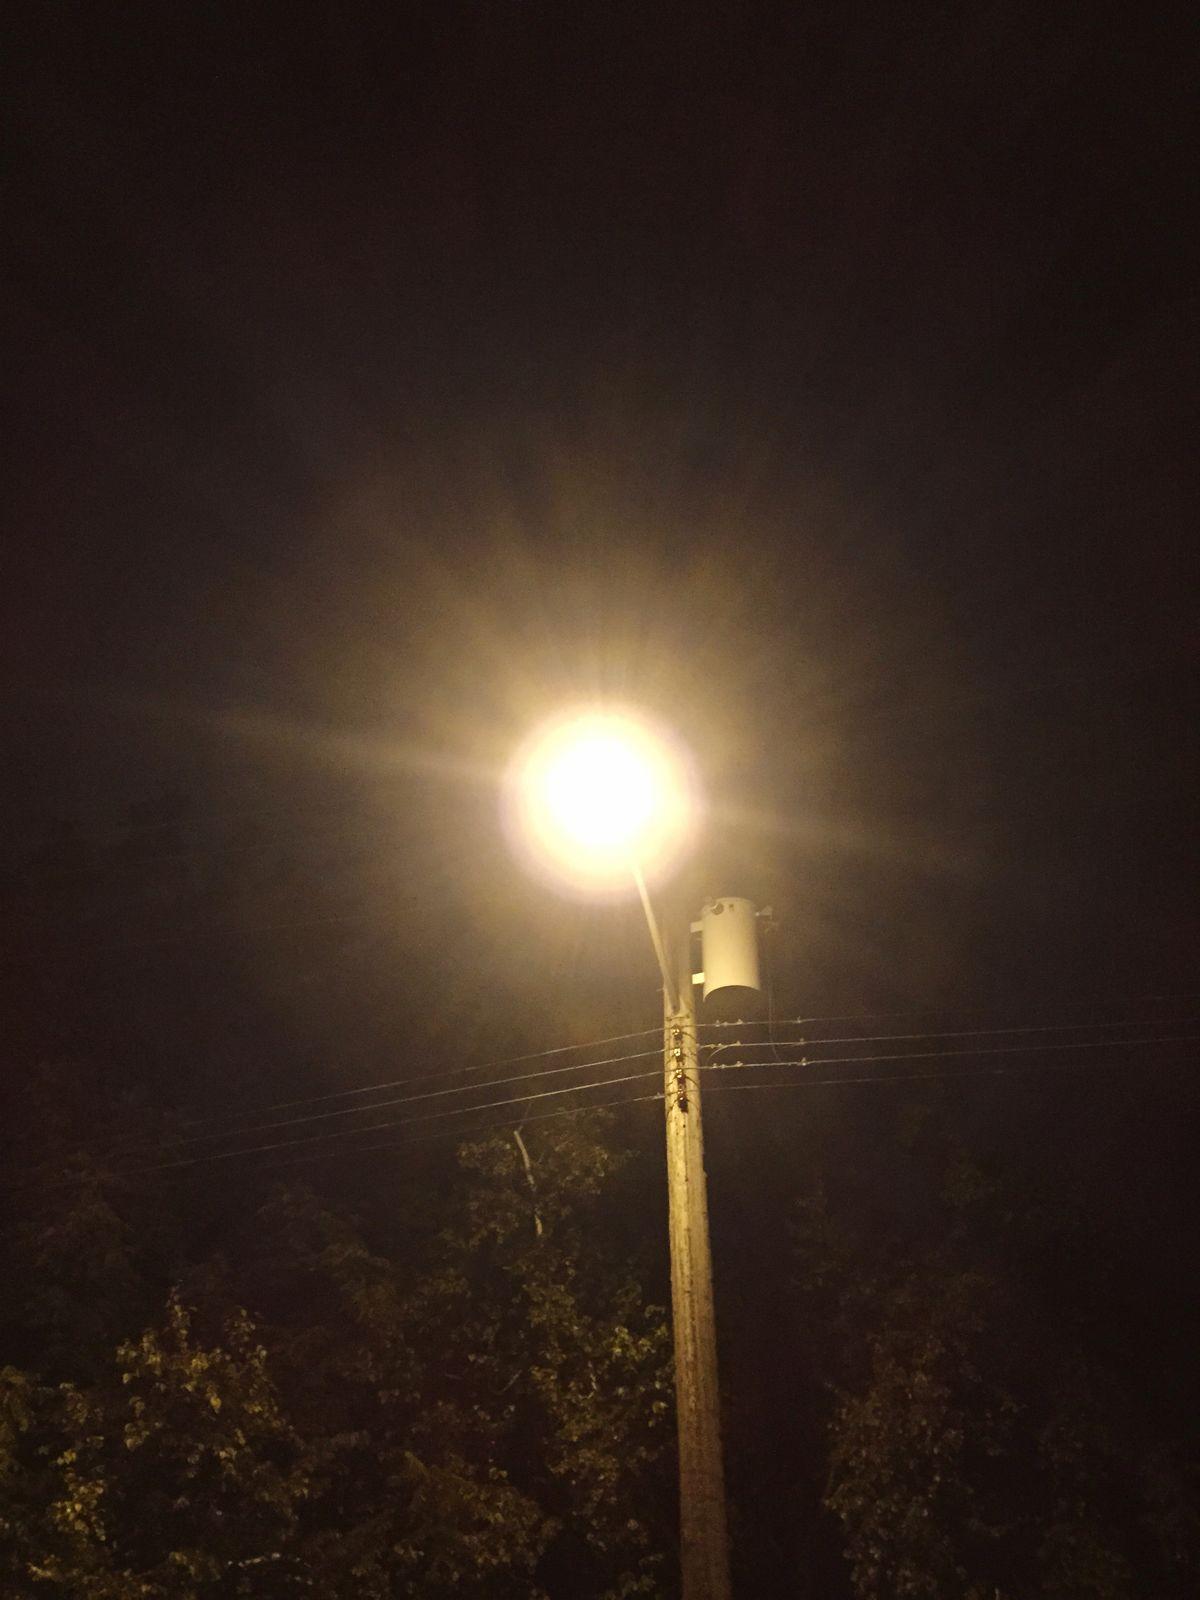 DesrochesPhotography NightTimeView Streetlight RightNight BrightSight PerfectCapture IncreasingTillt DopeEyeEmPhotos RealistLivin BeTheImage